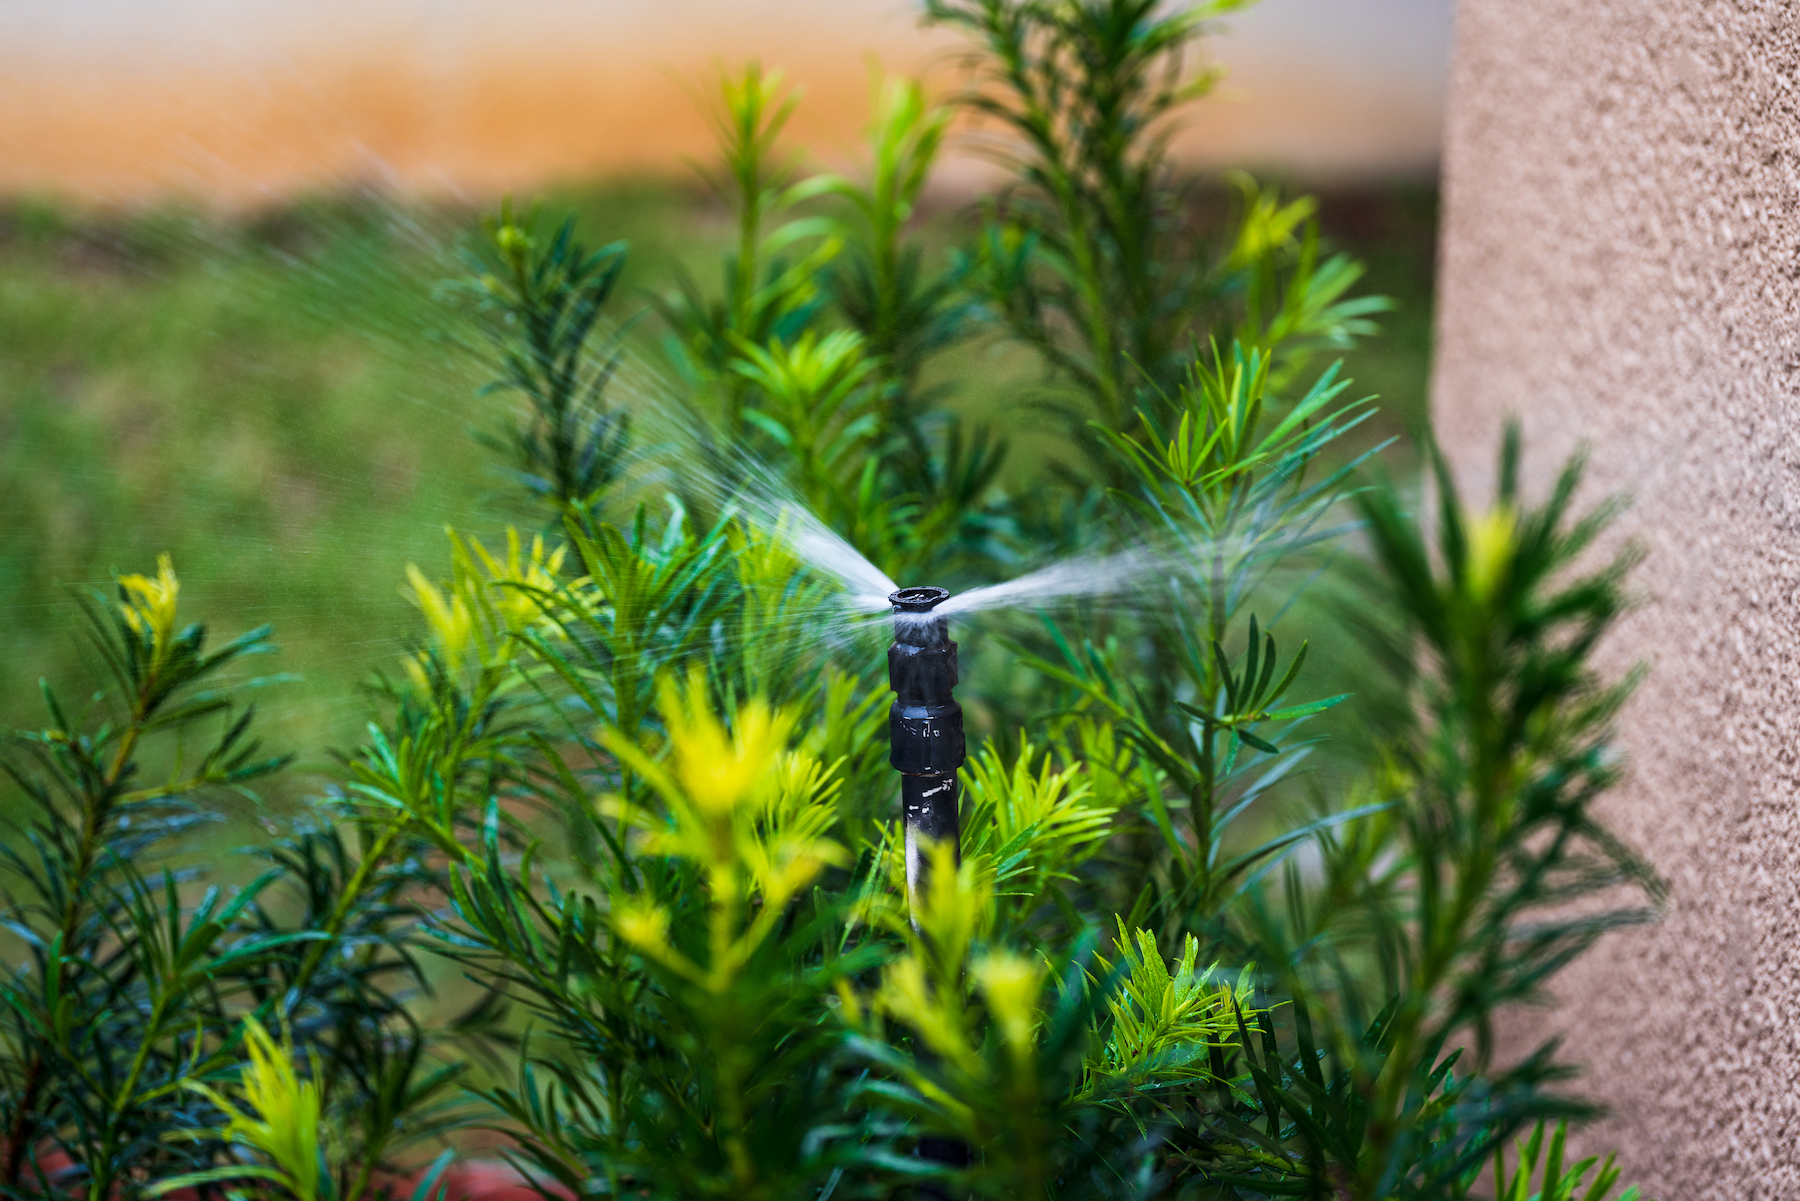 Spray Irrigation Head